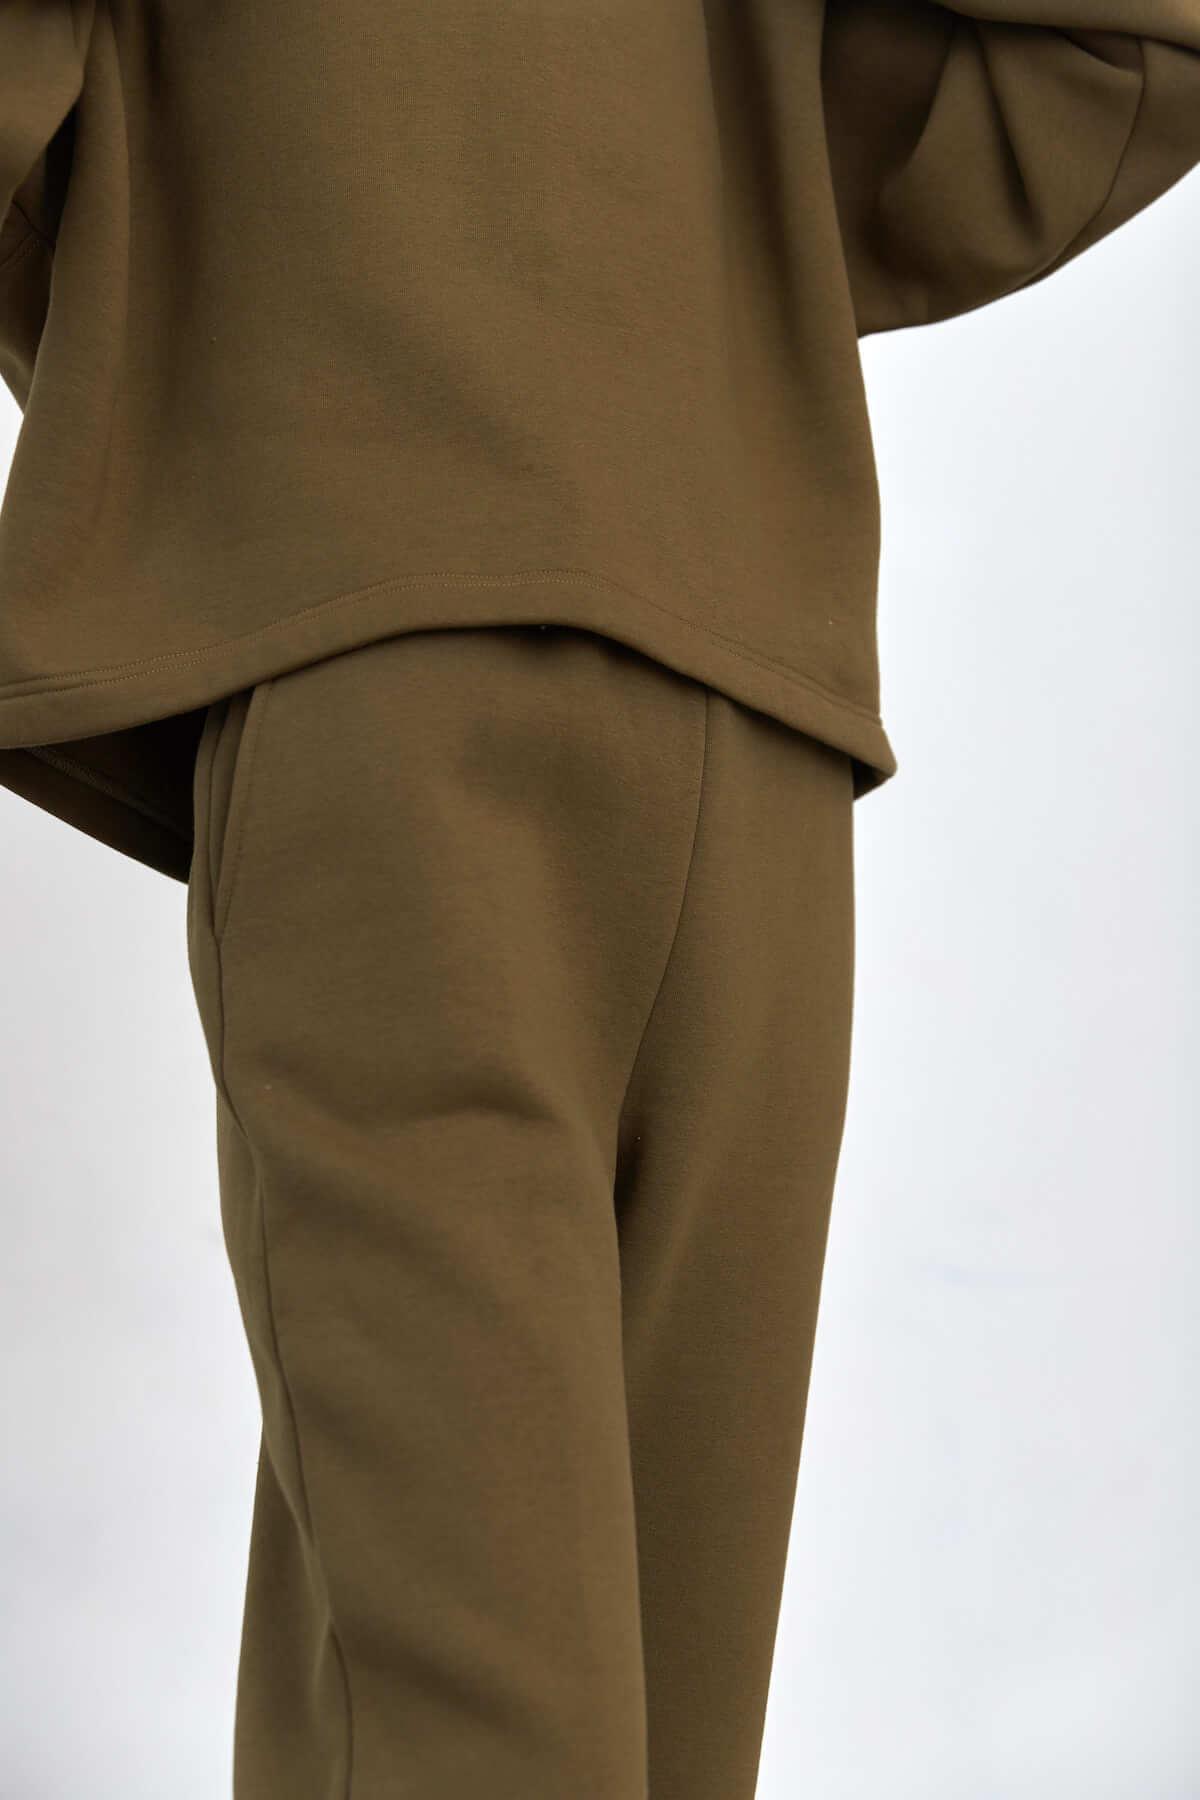 Брюки-джогеры из мягкого футера, олива